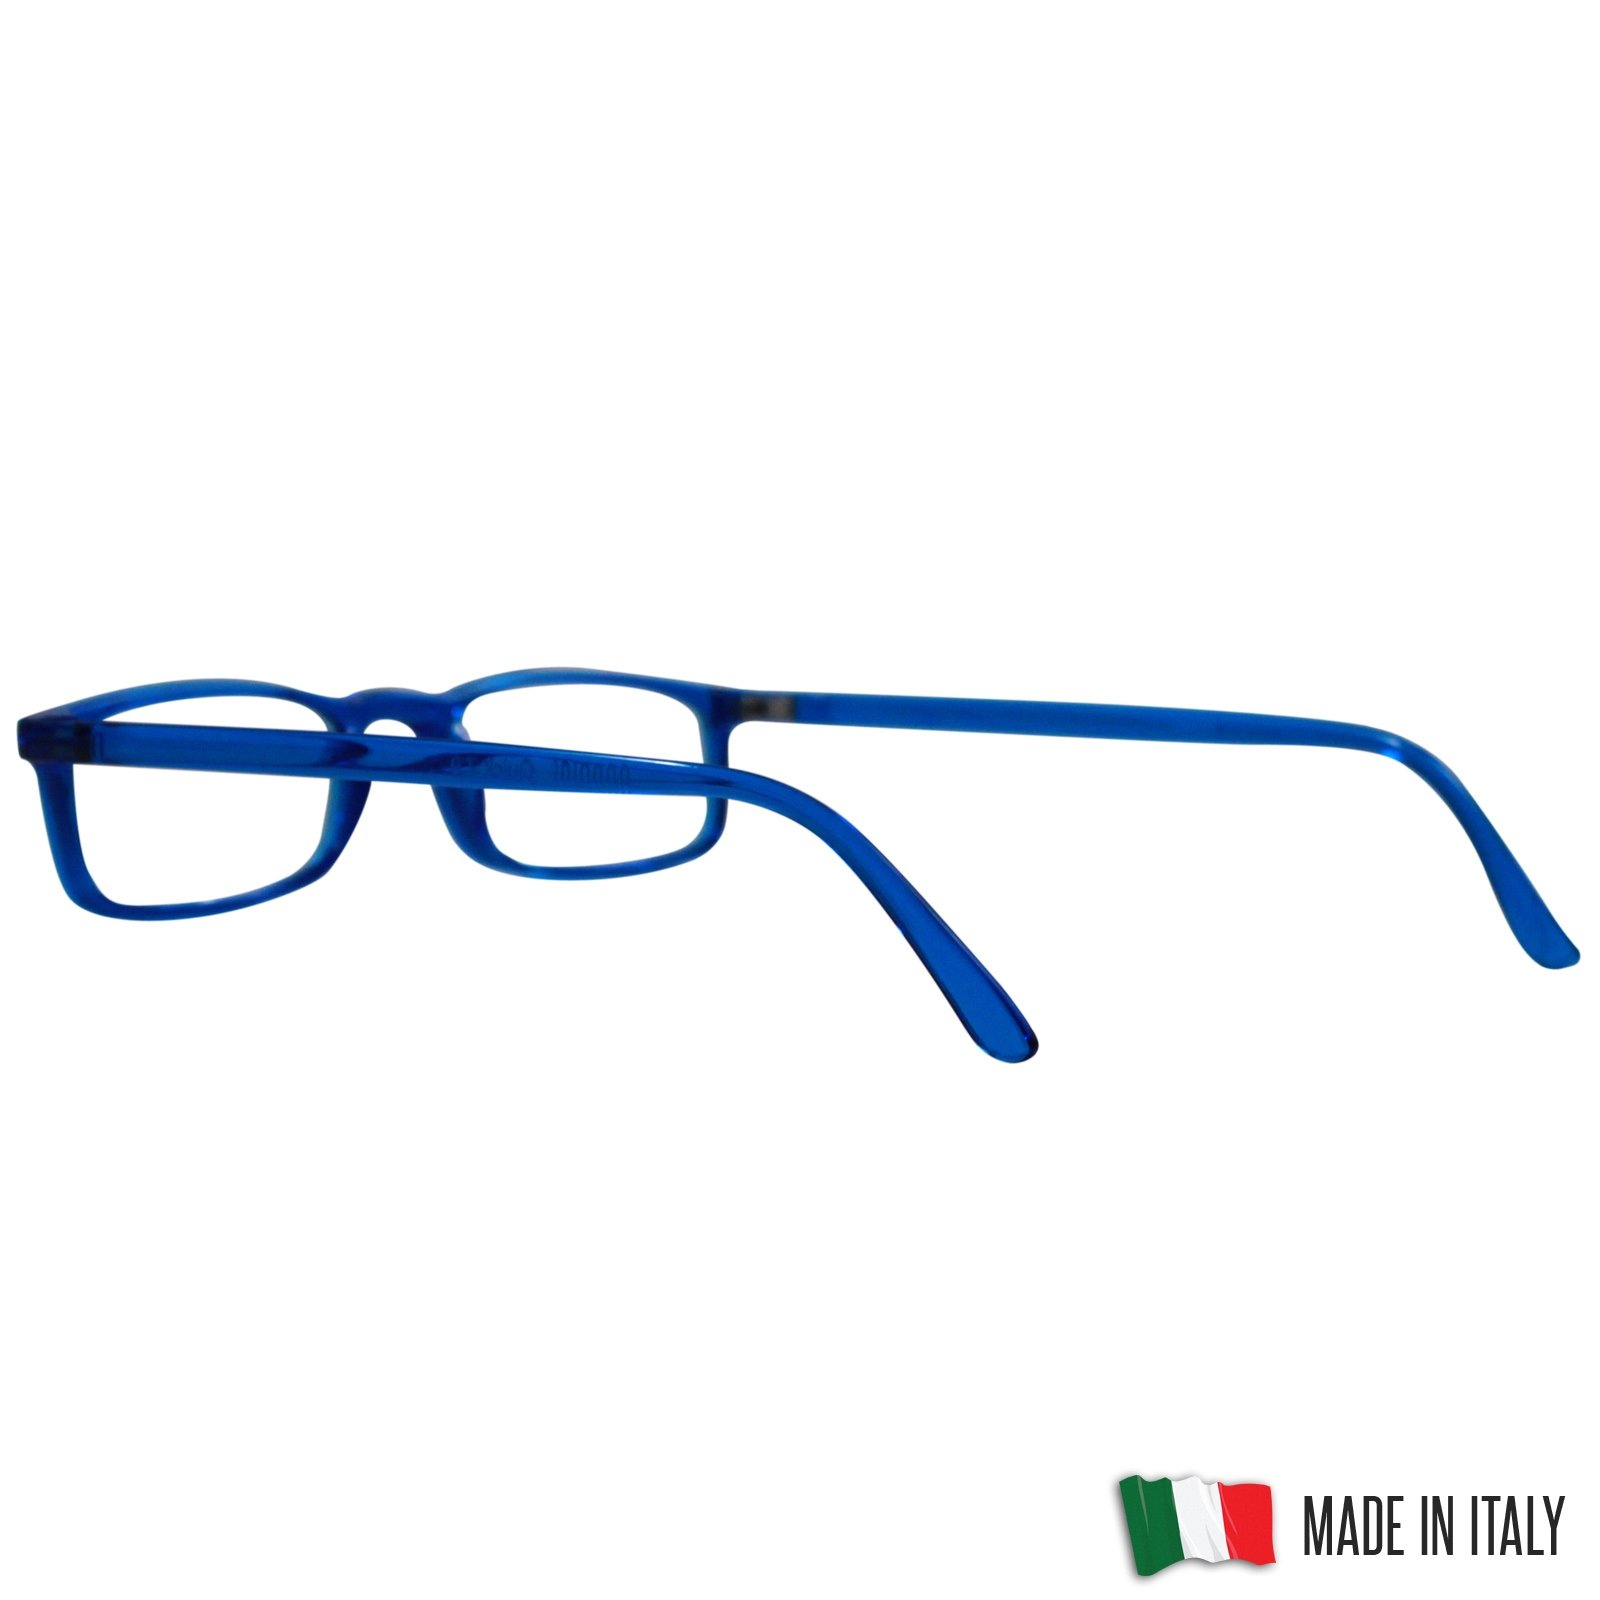 Reading Glasses Nannini Optics Vision Care Italian Fashion Readers - Blue 3.0